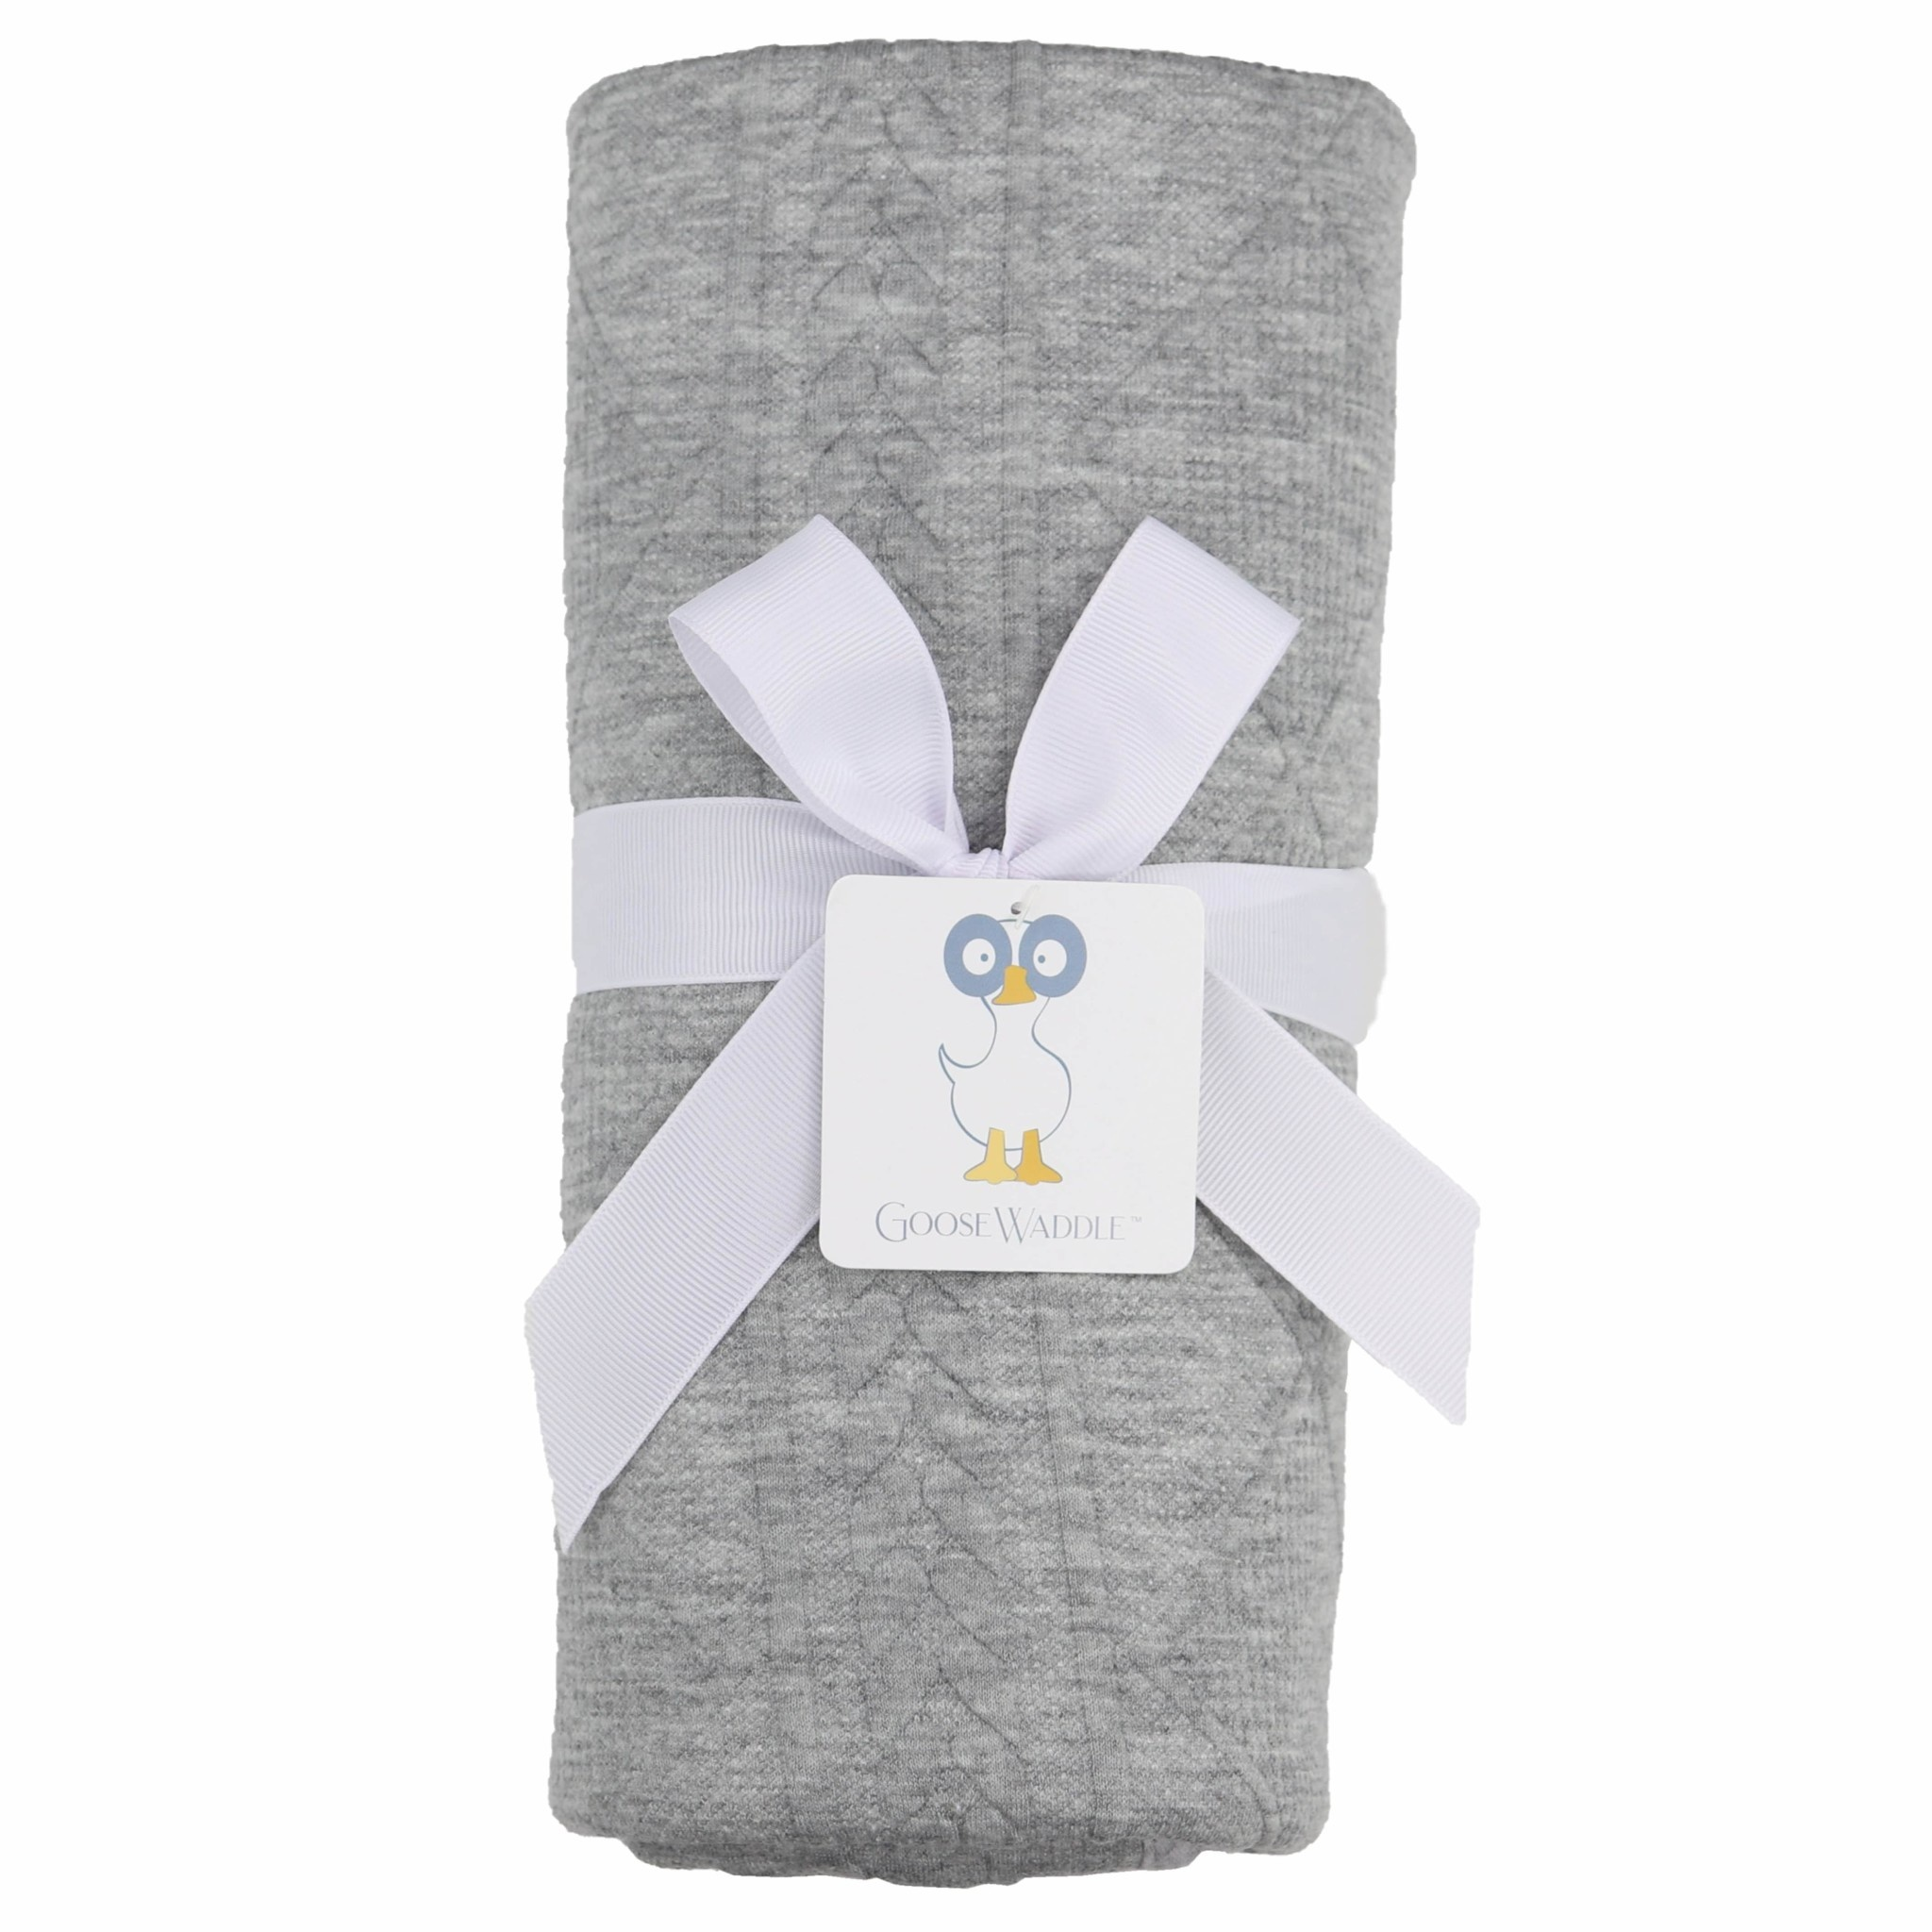 Goosewaddle Gray Knit Blanket